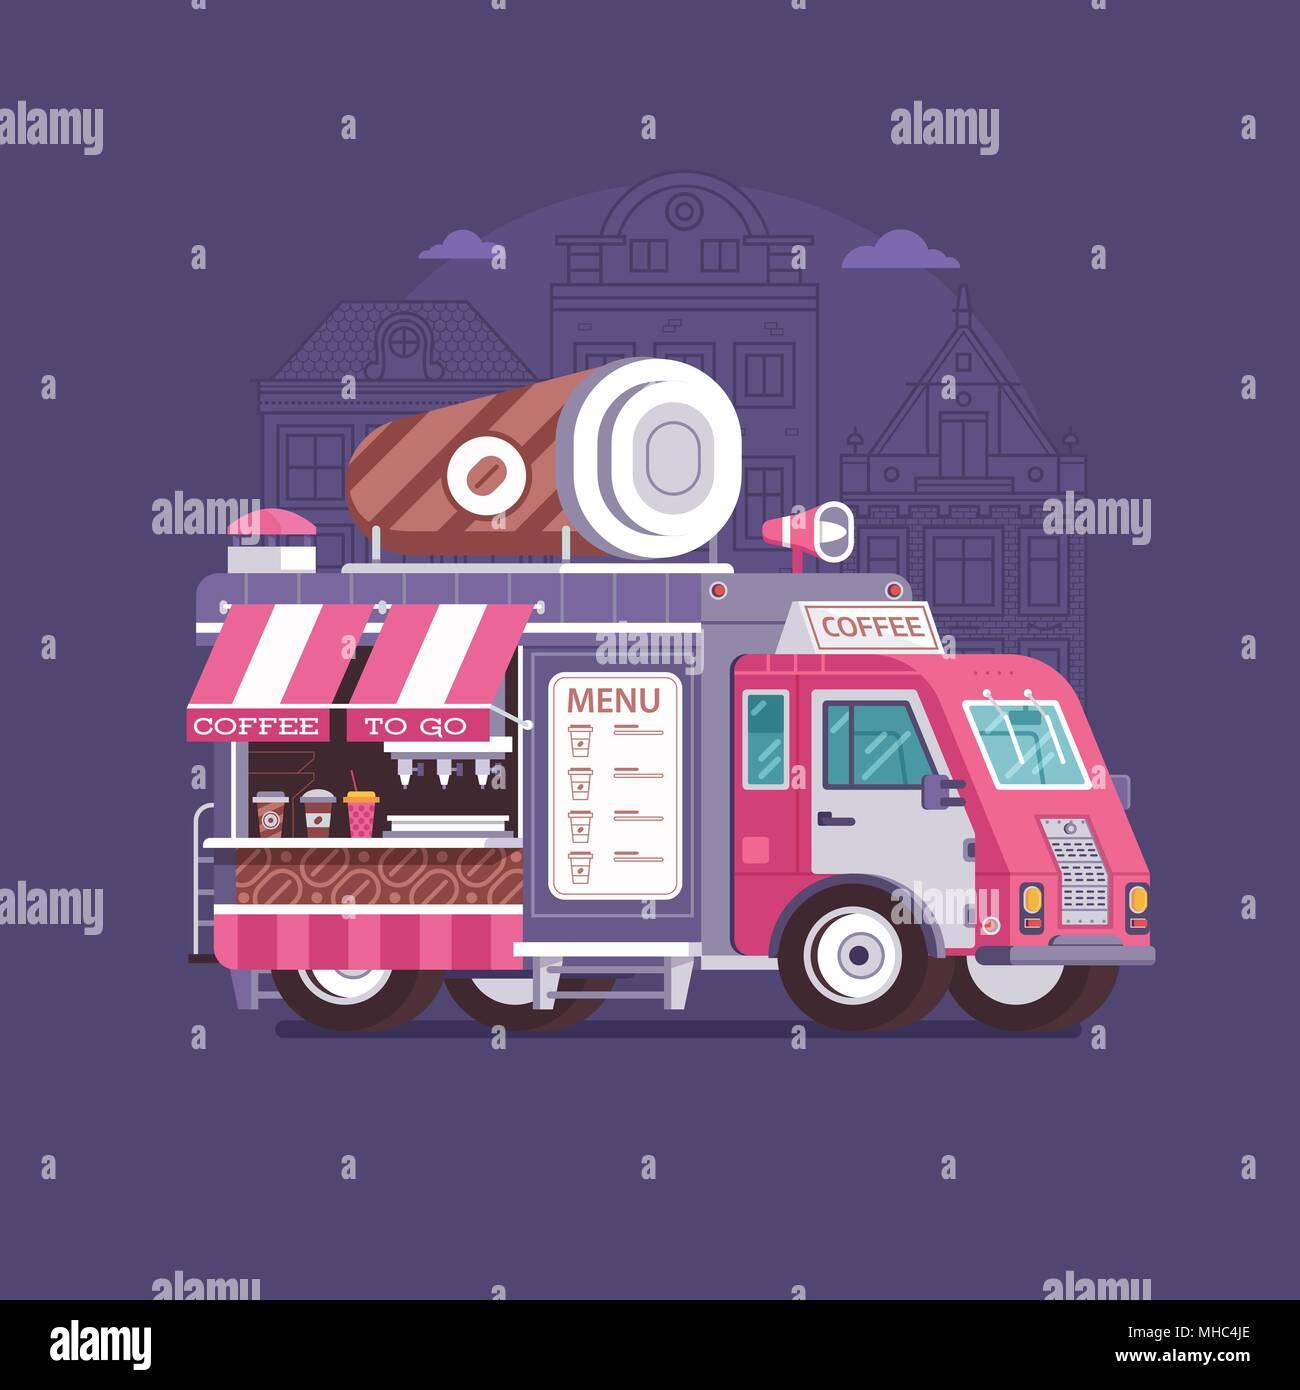 retro coffee van in flat design city street food truck with cafe cup summer kitchen auto kiosk in flat design cartoon car with food on wheels illus - Summer Kitchen Menu